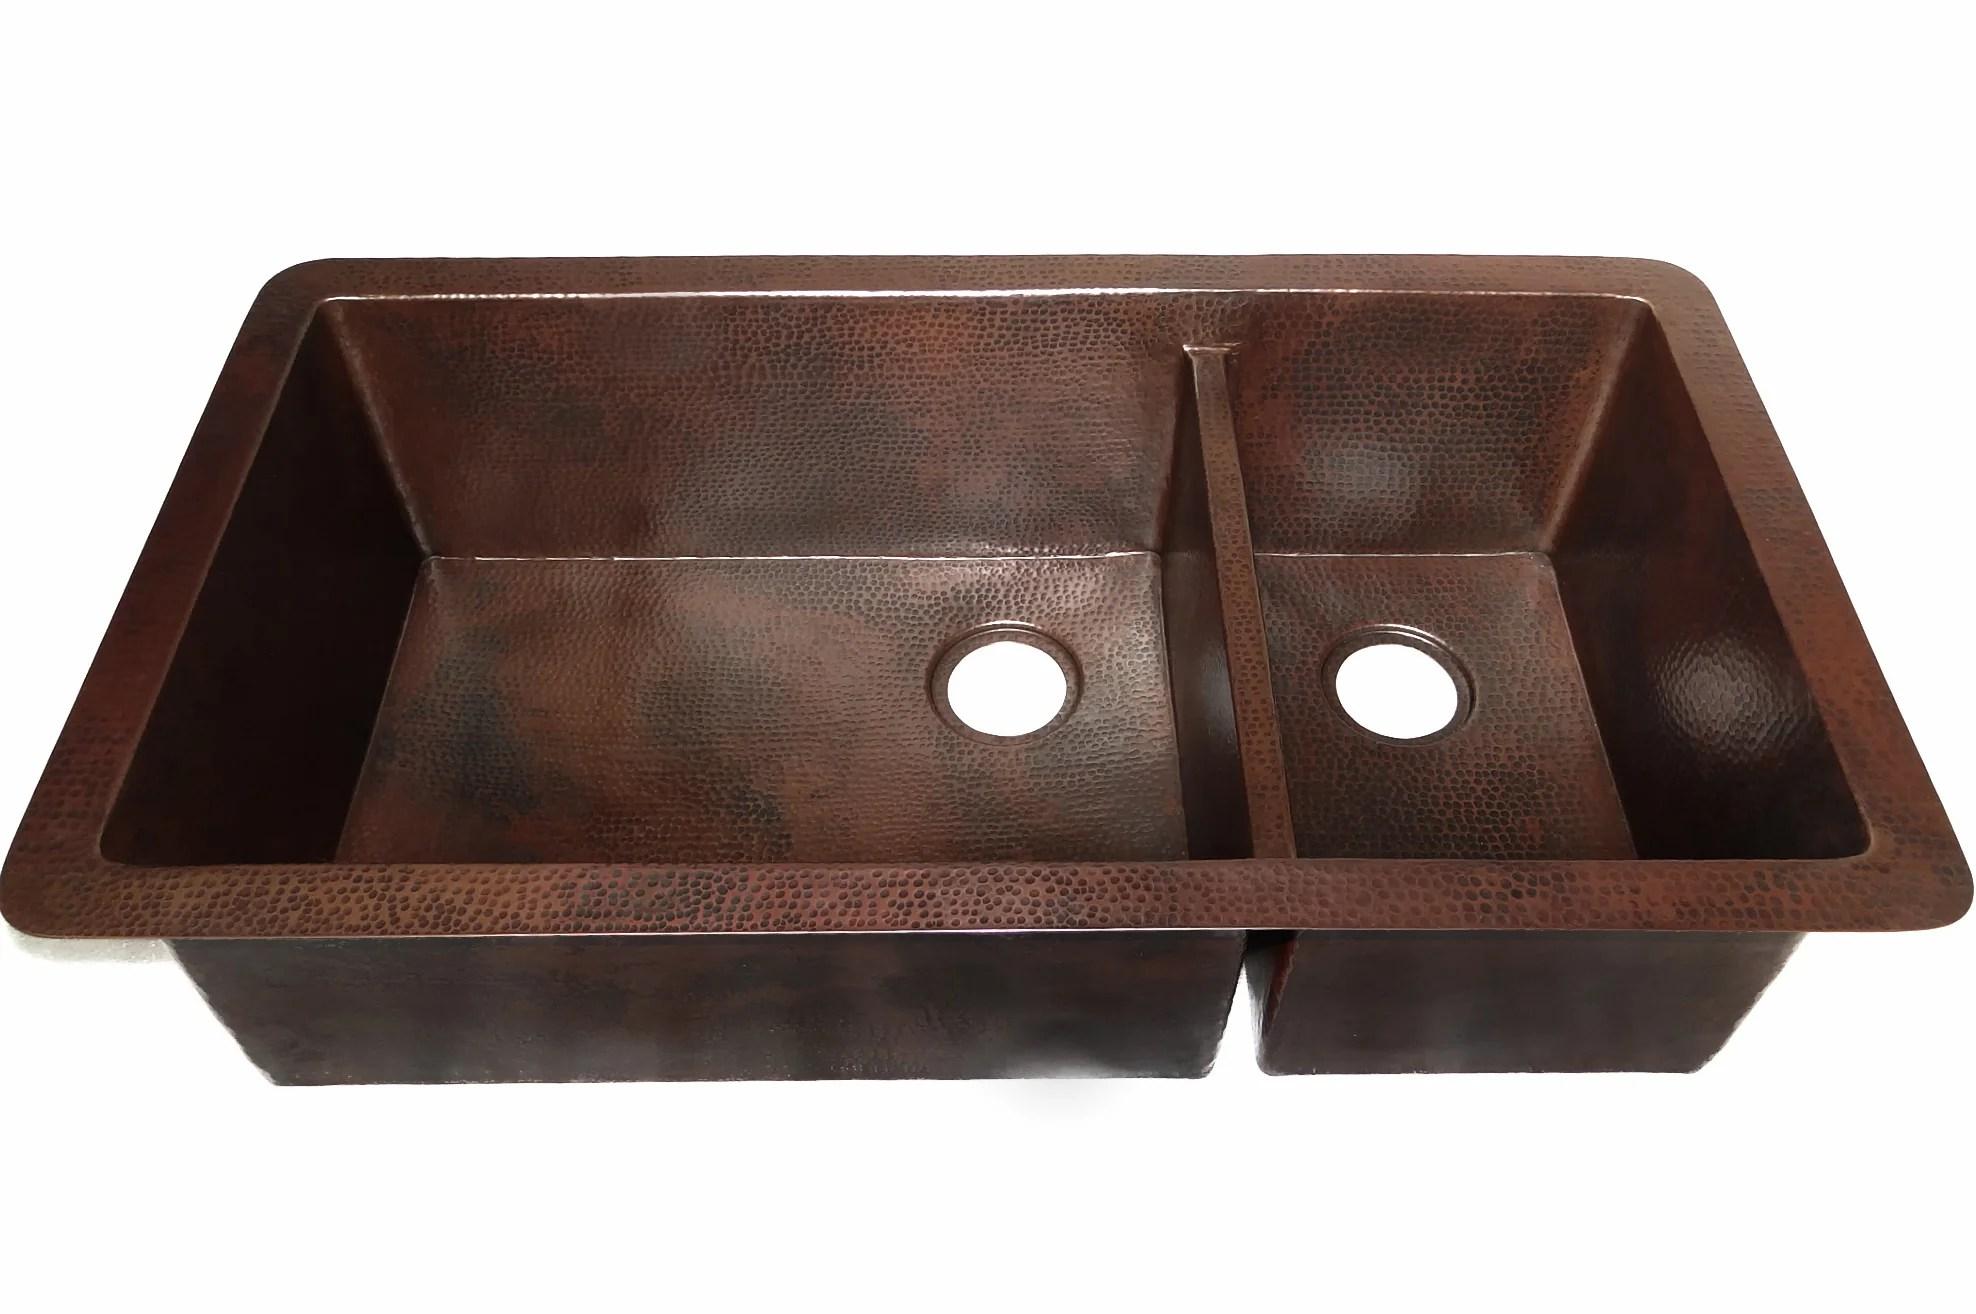 cocina master duo undermount kitchen copper sink double basin 40 x 22 x 10 5 ks011cv